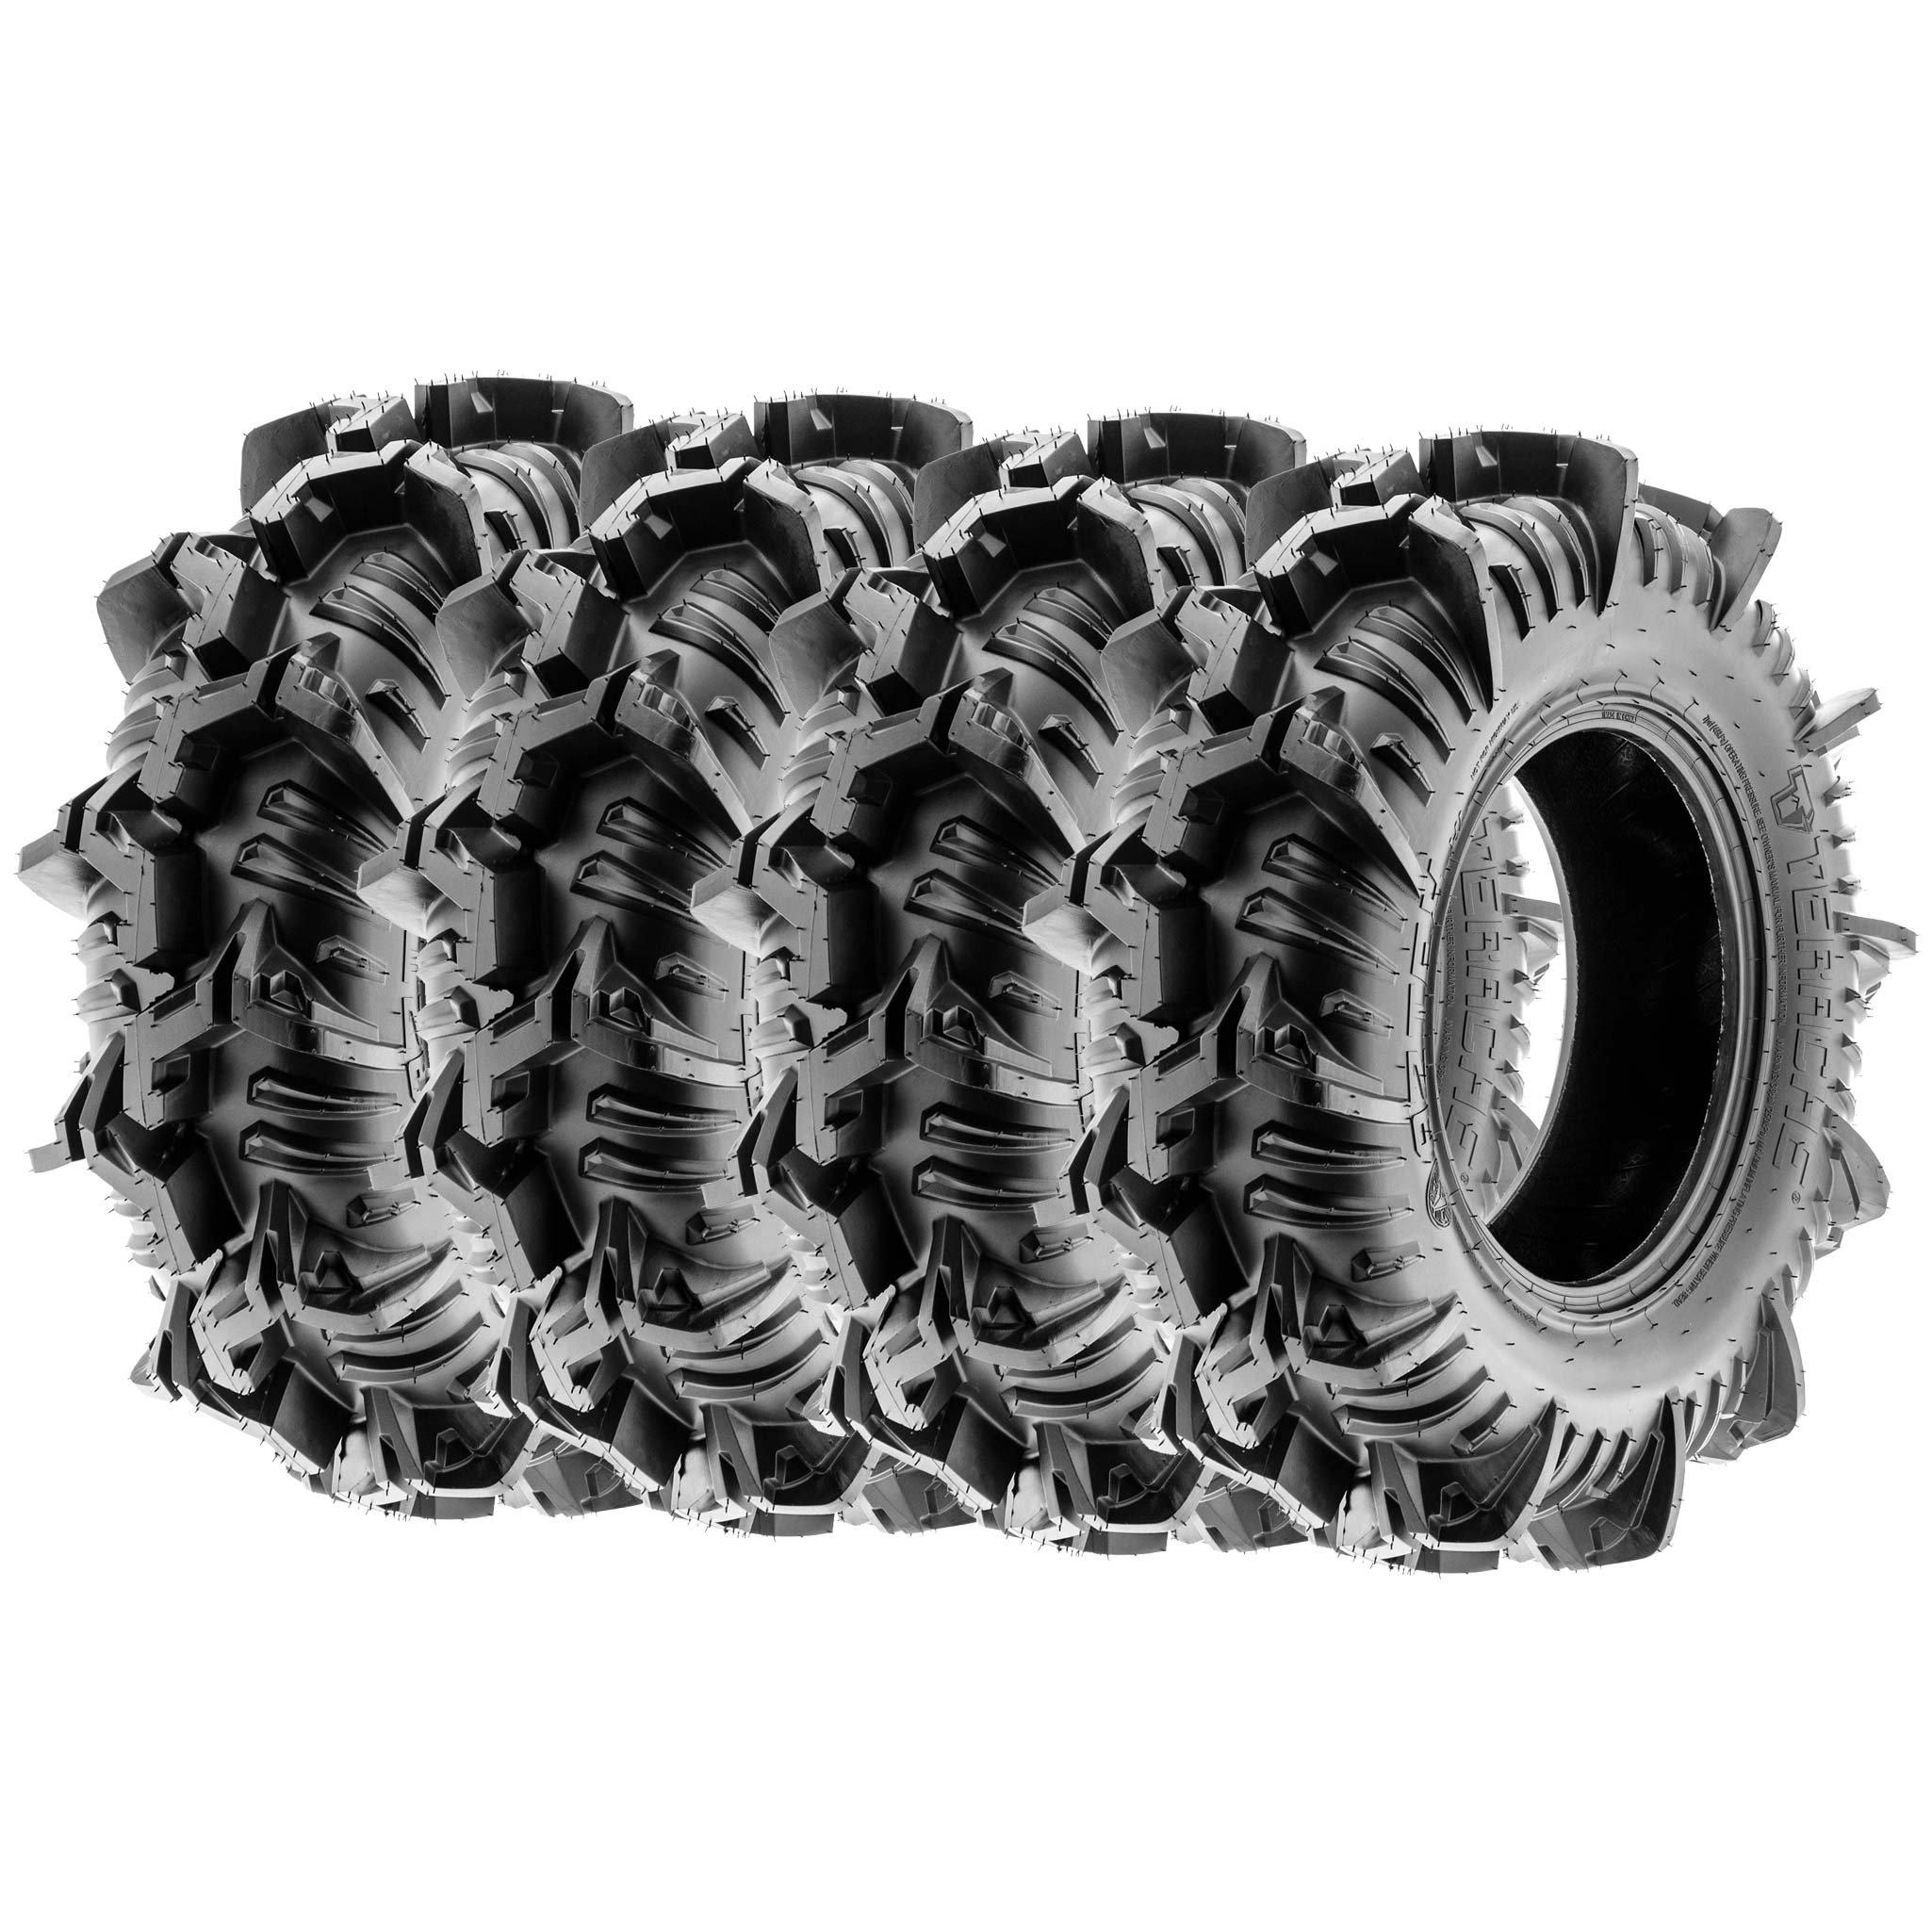 Terache AZTEX MT Mud A/T UTV Tires 30x9-14 30x9x14 8 Ply (Full set of 4, Front & Rear)